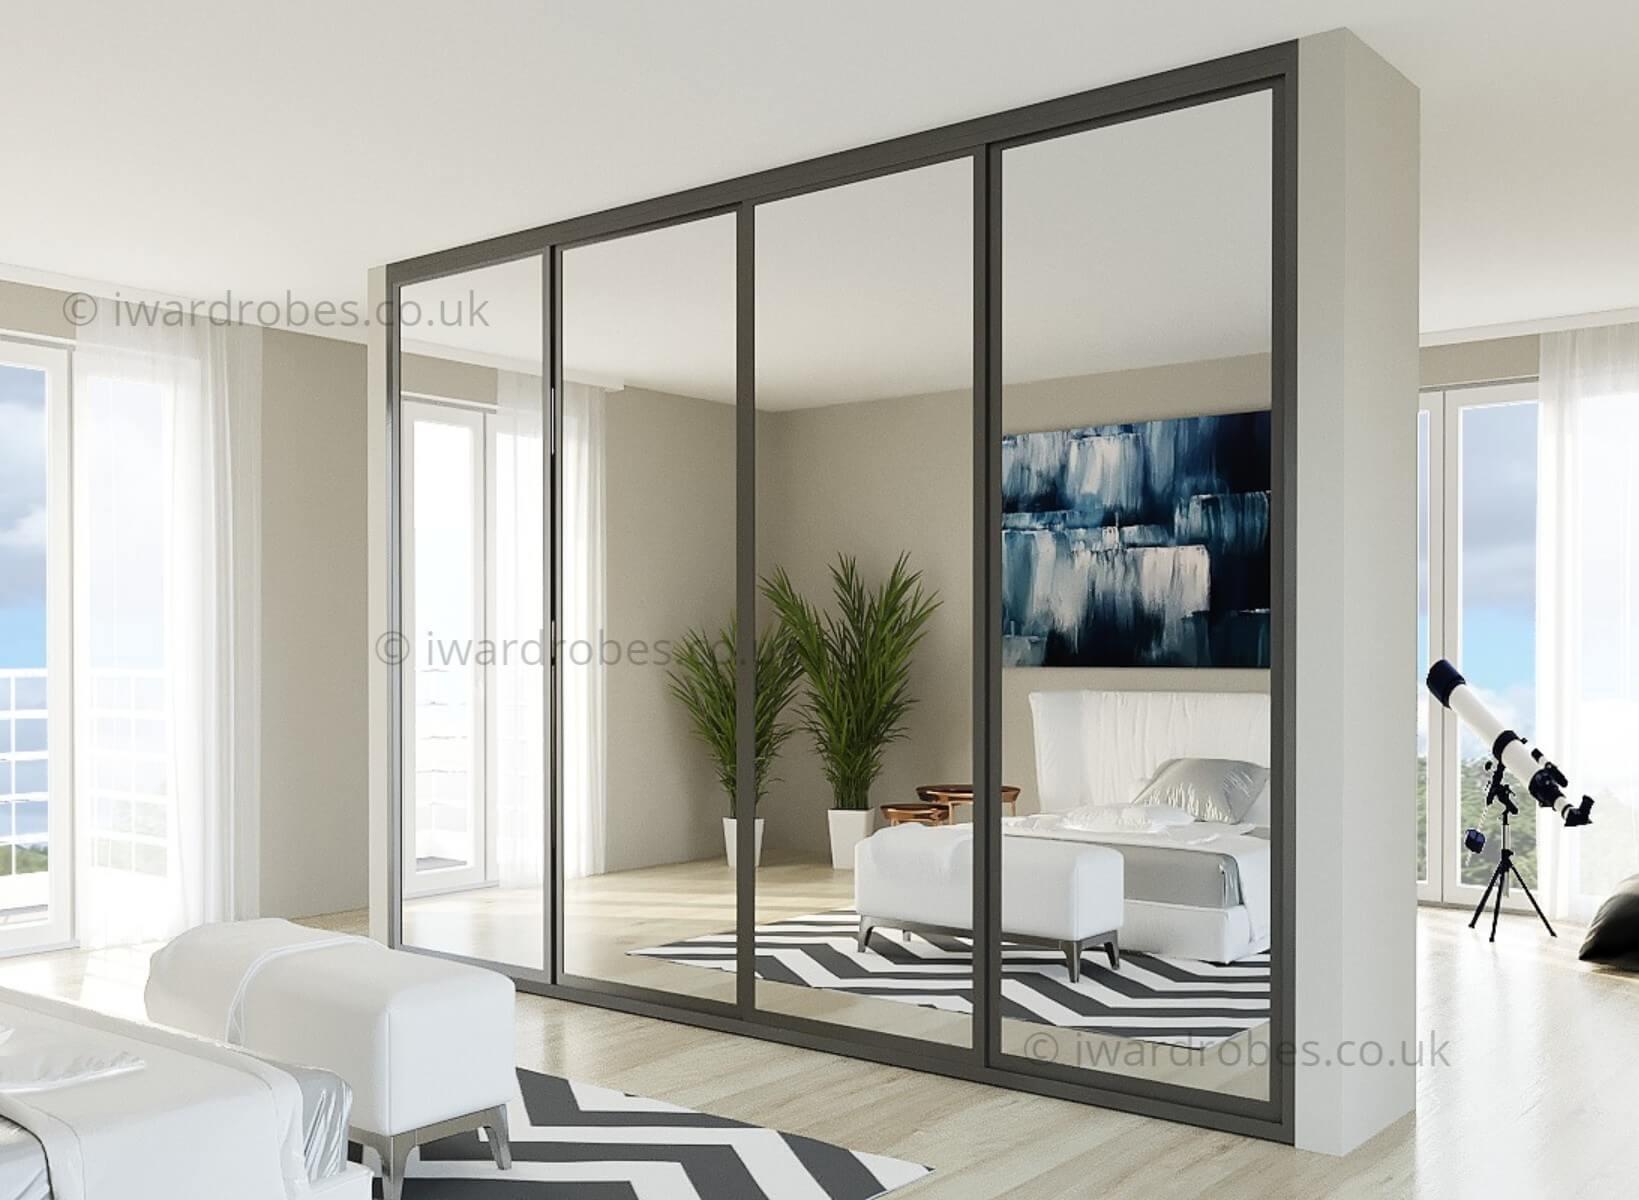 bedroom mirror sliding door wardrobe (003)